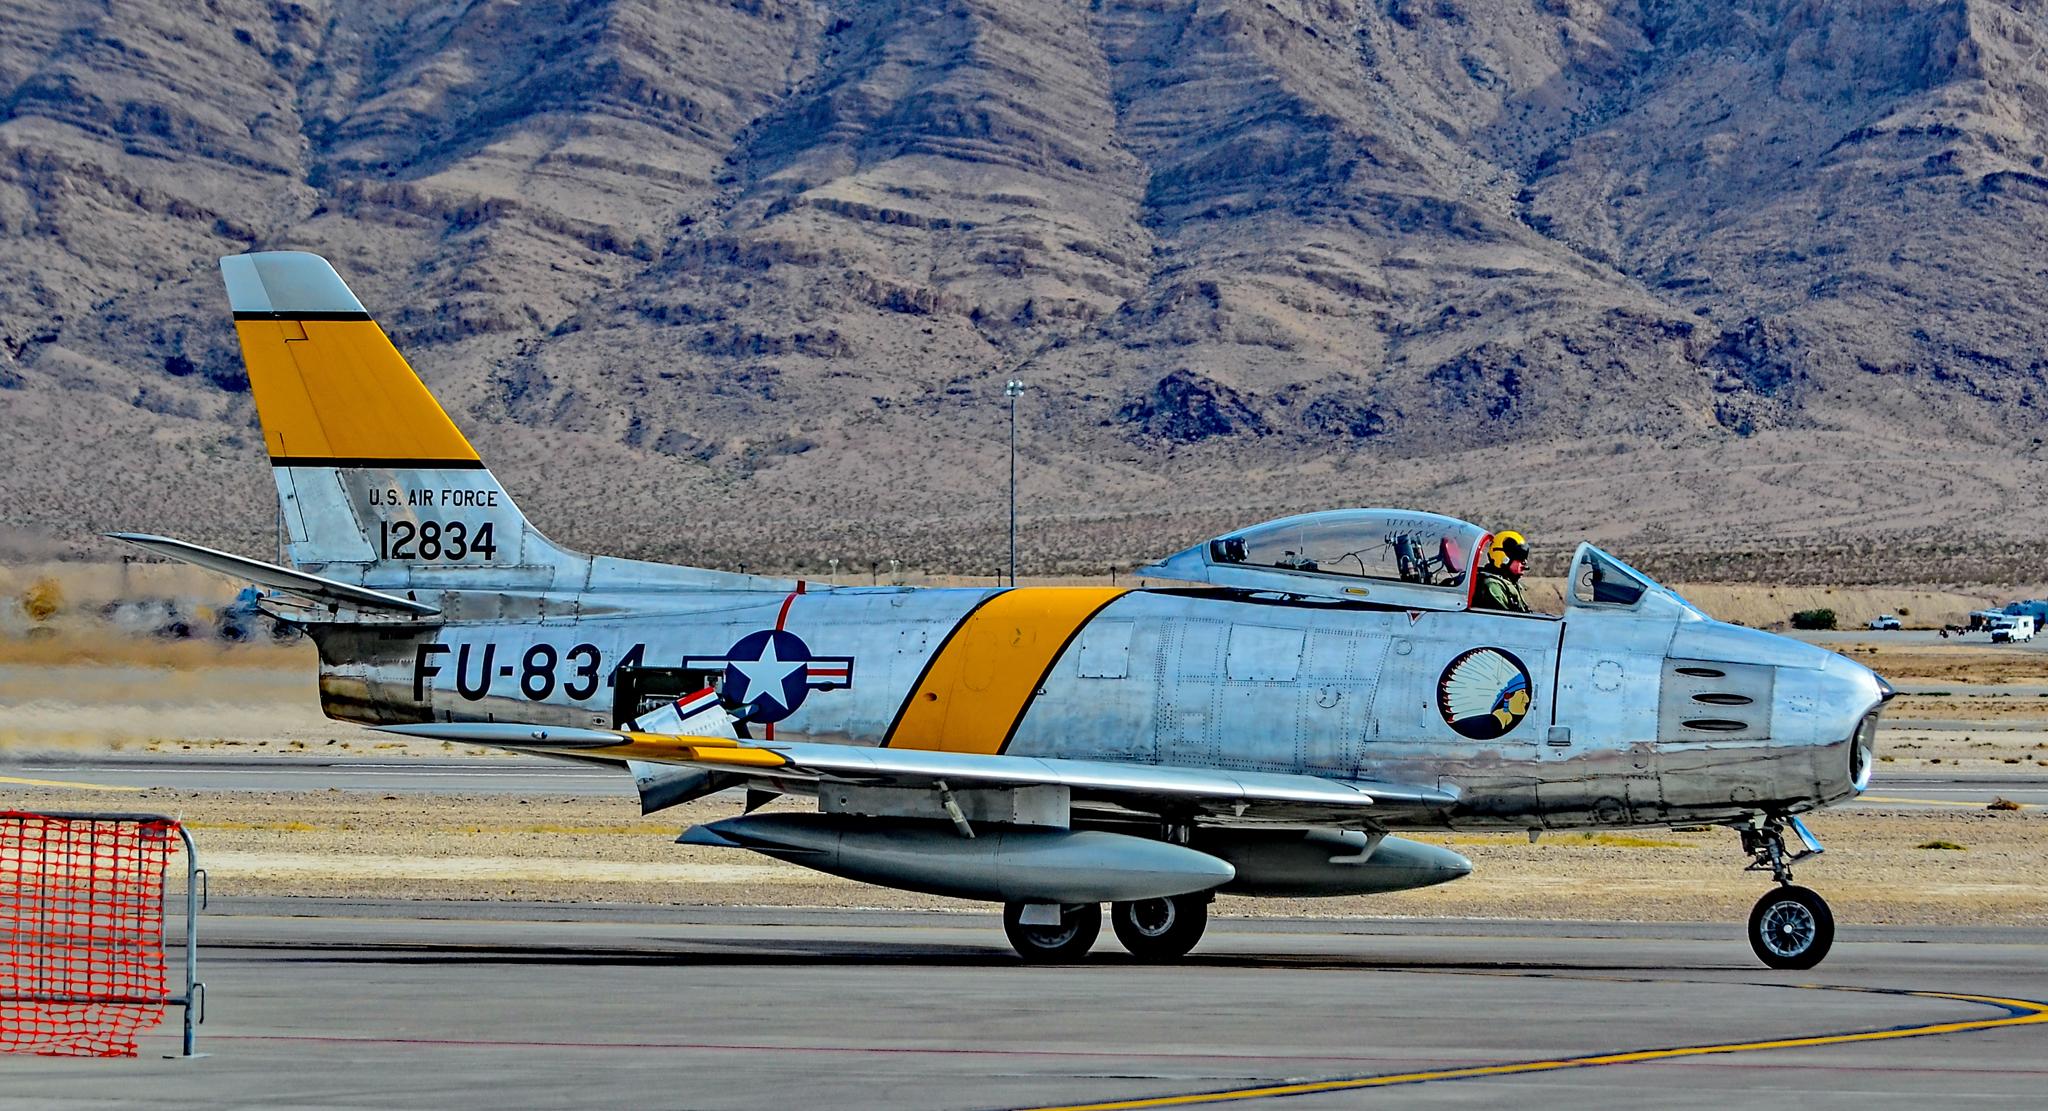 File:N186AM 1952 North American F-86F Sabre C-N 191-708 FU-